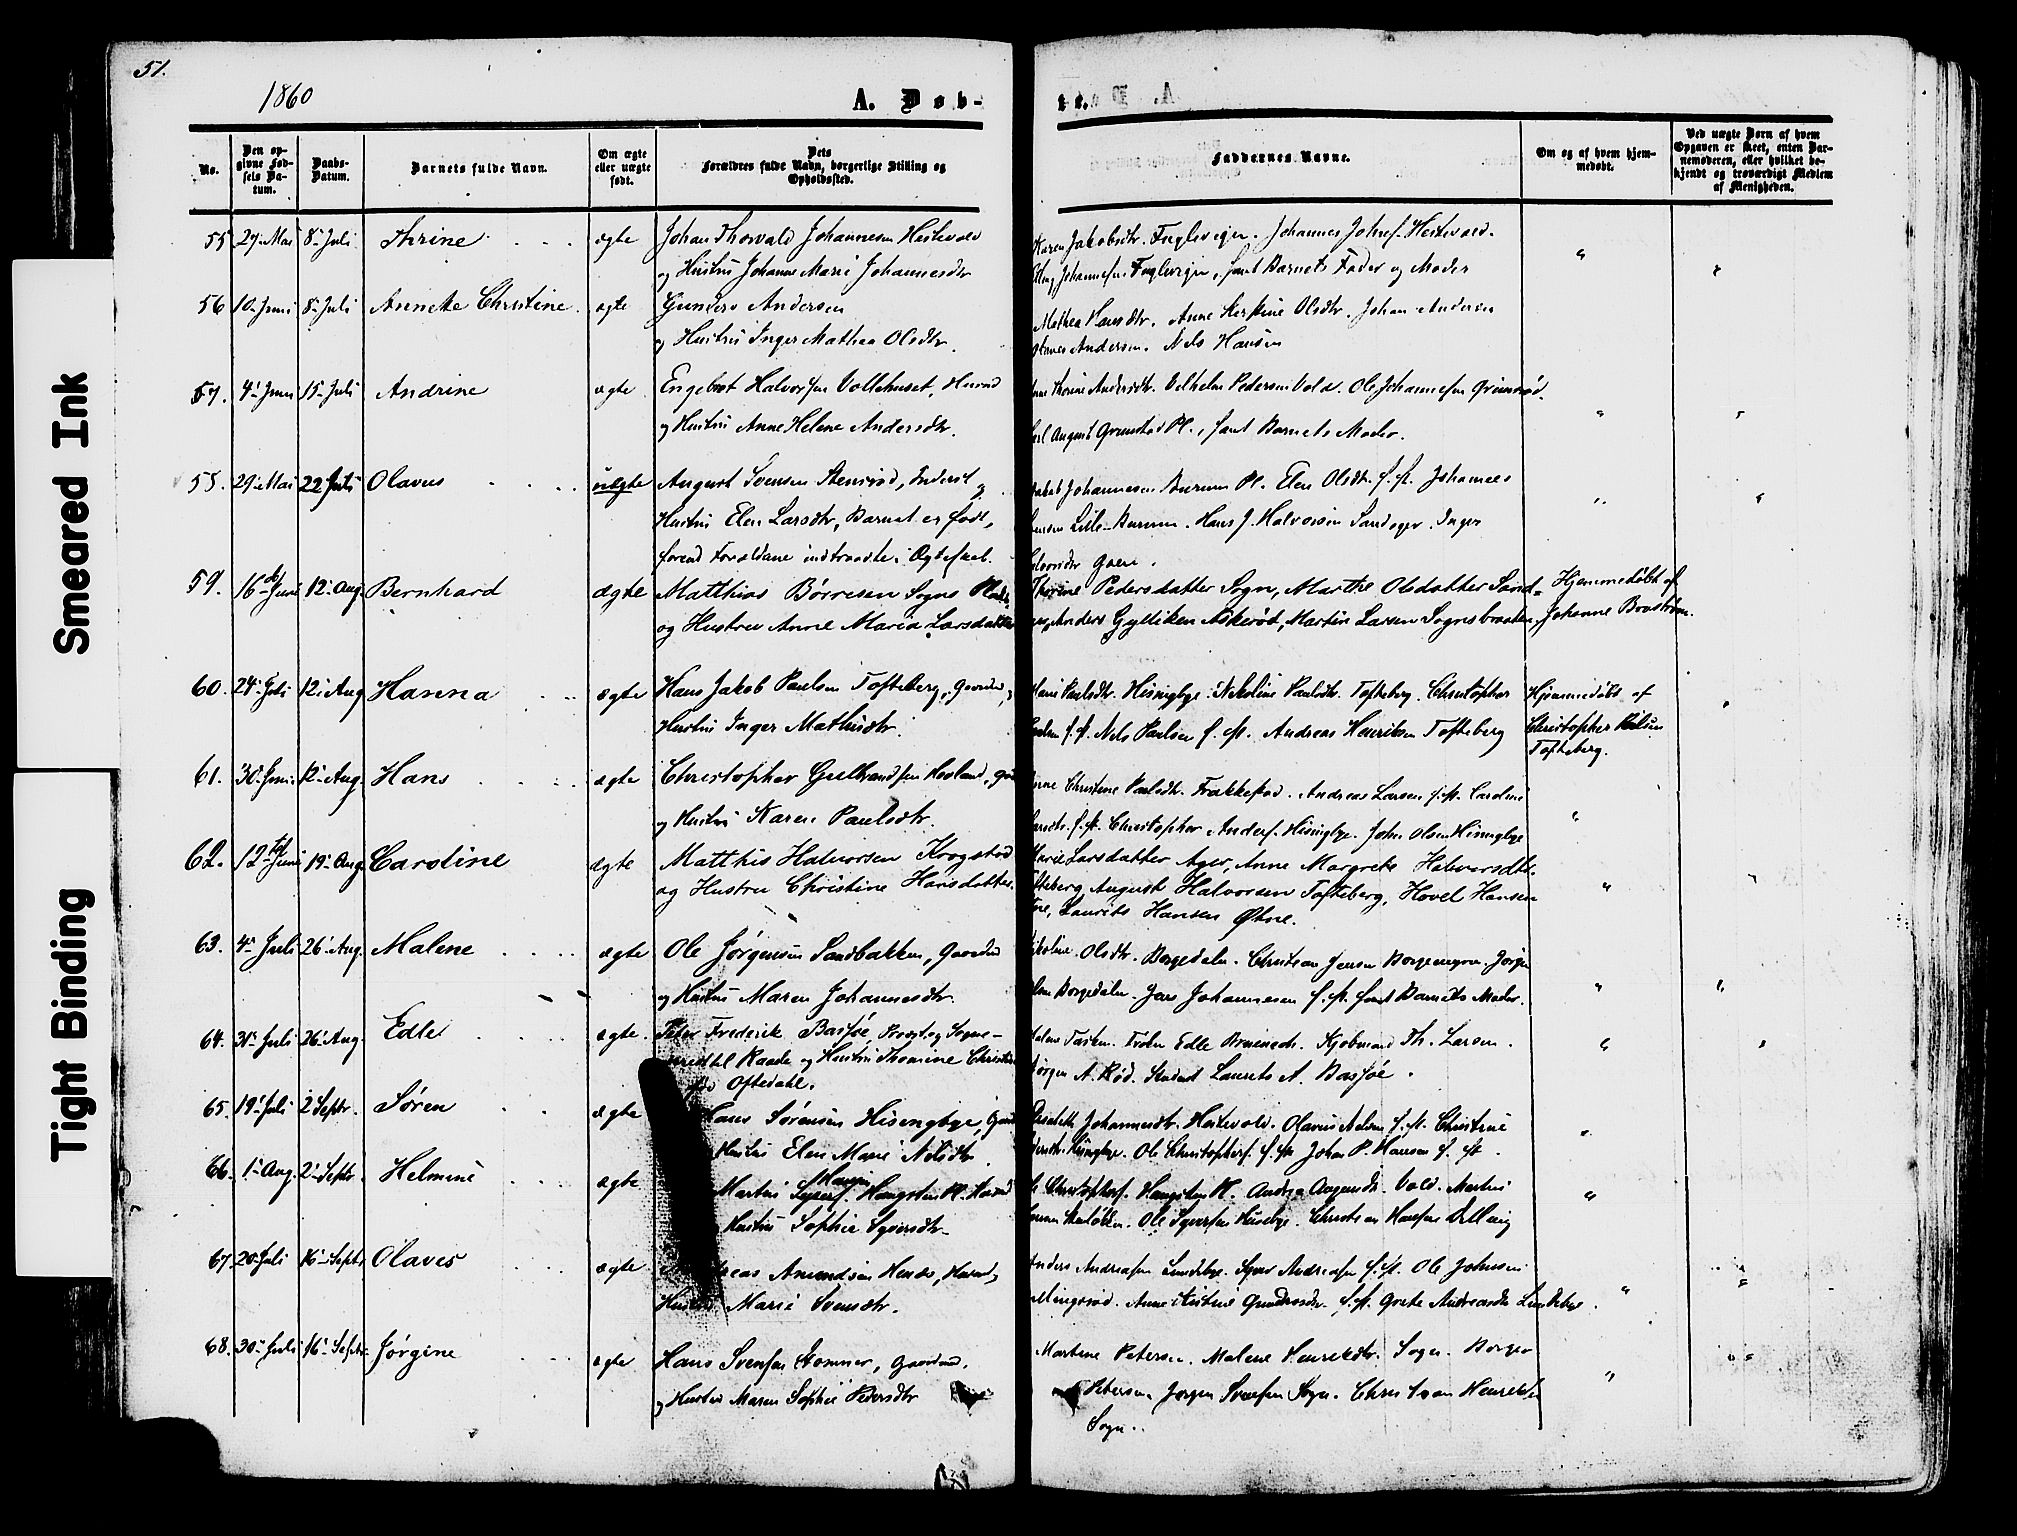 SAO, Råde prestekontor kirkebøker, F/Fa/L0006: Ministerialbok nr. 6, 1854-1877, s. 51